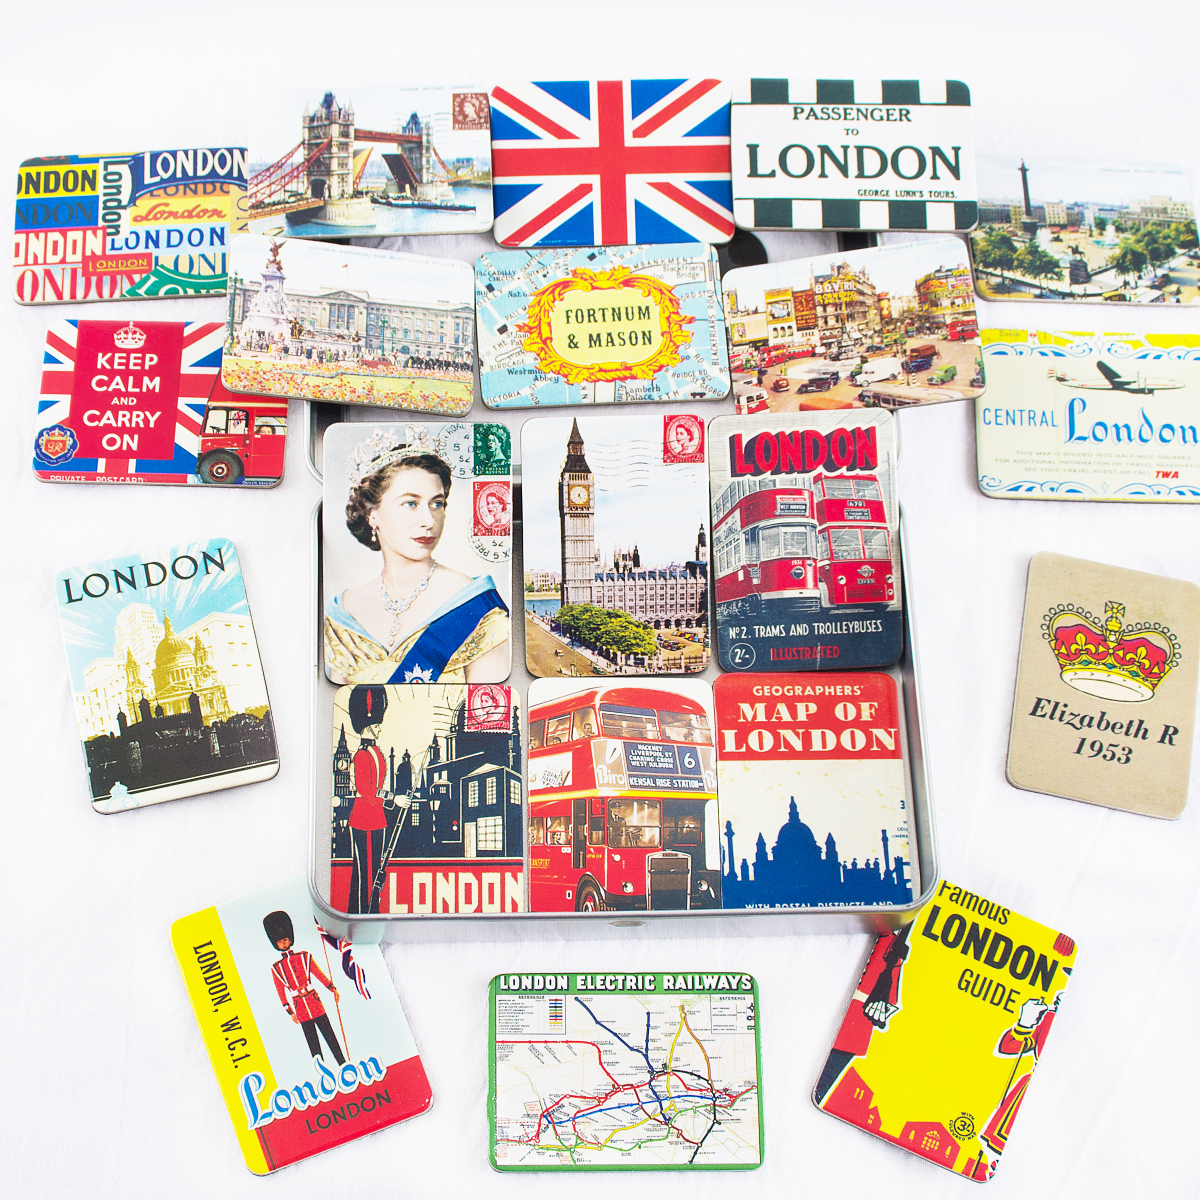 Souveniers-photos-Sandra-Sergeant-Photography-Basingstoke-Passport-Photographs